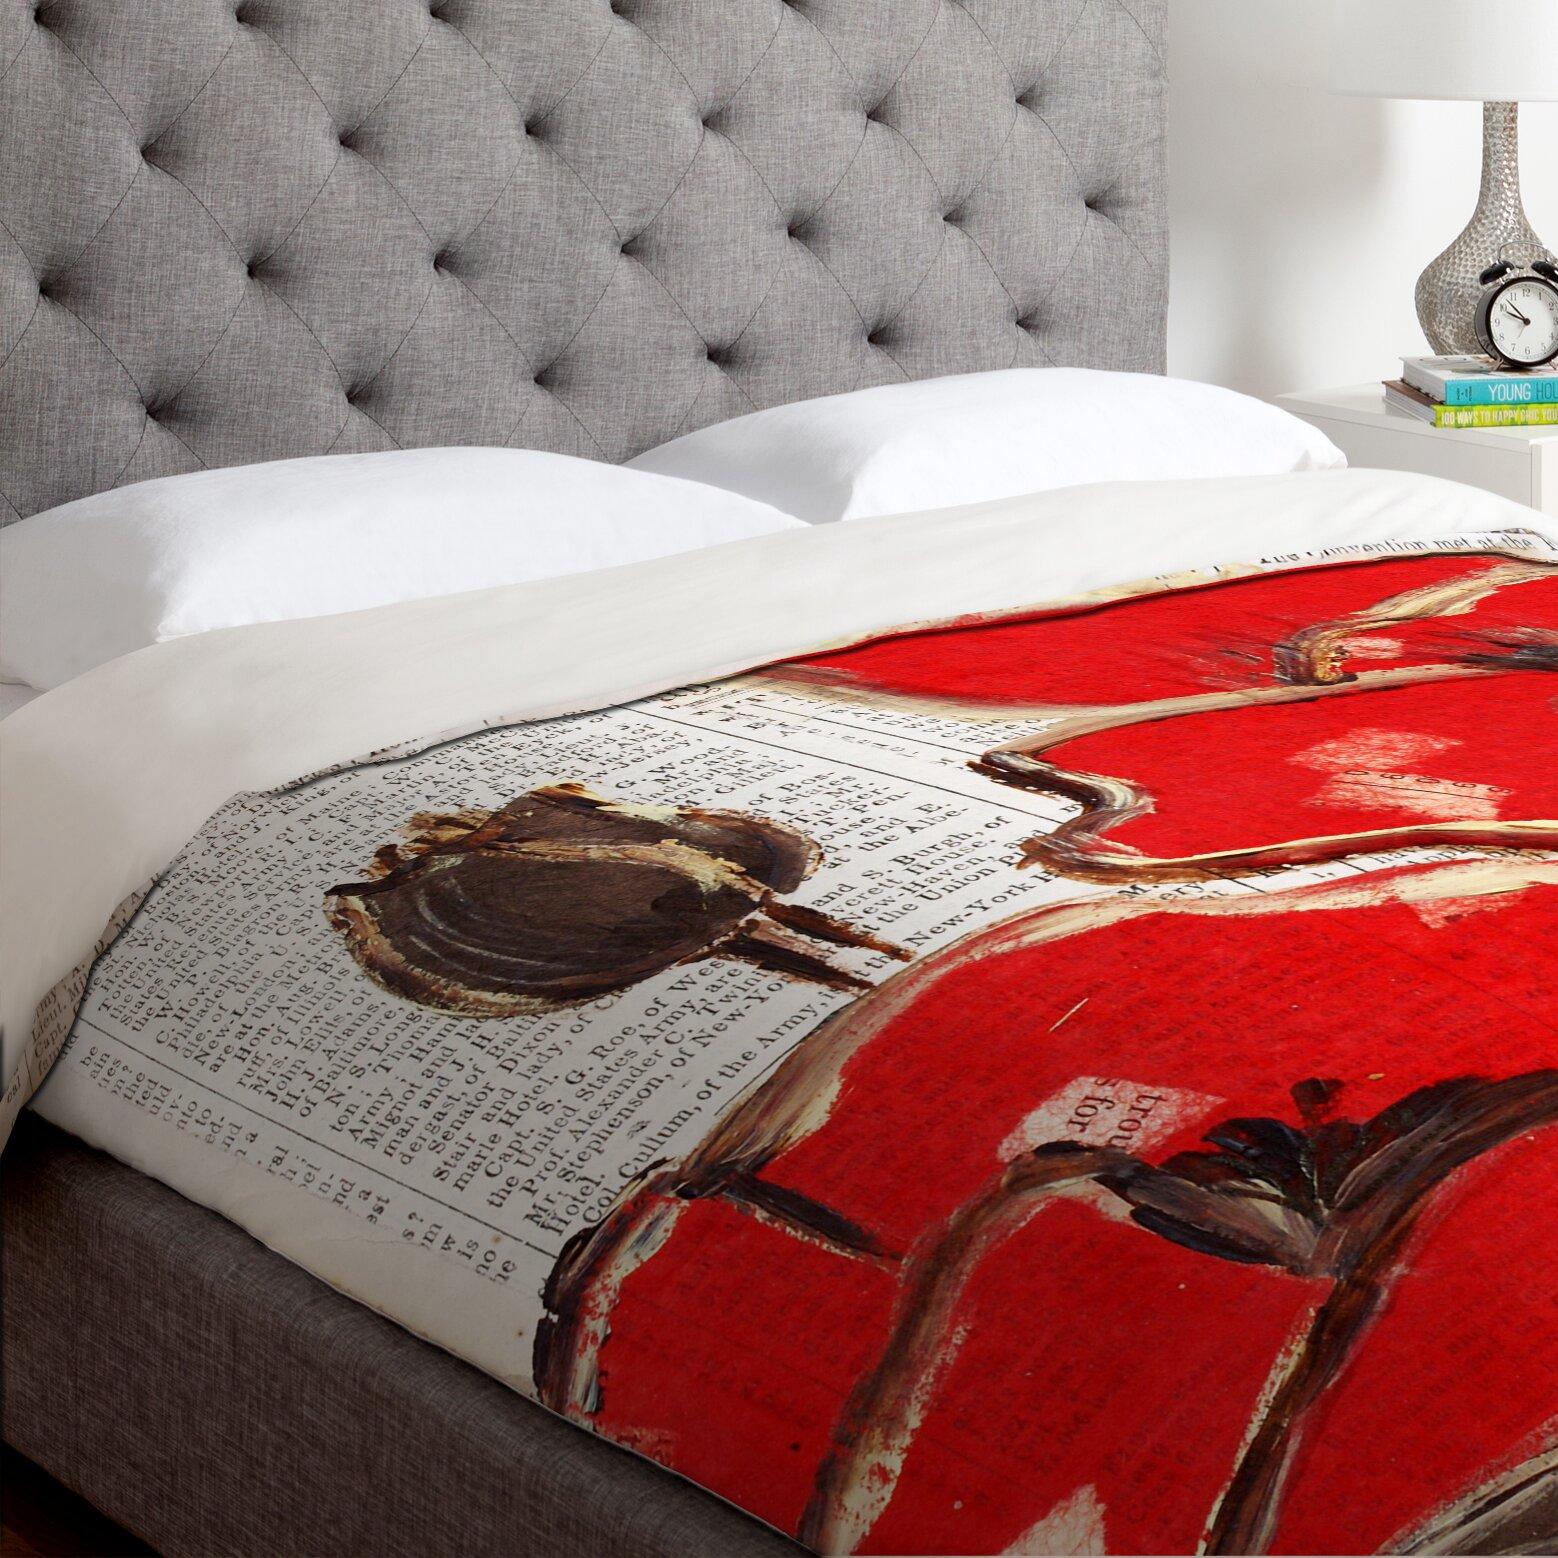 Brayden studio shumake duvet cover collection reviews for Studio one bed cover